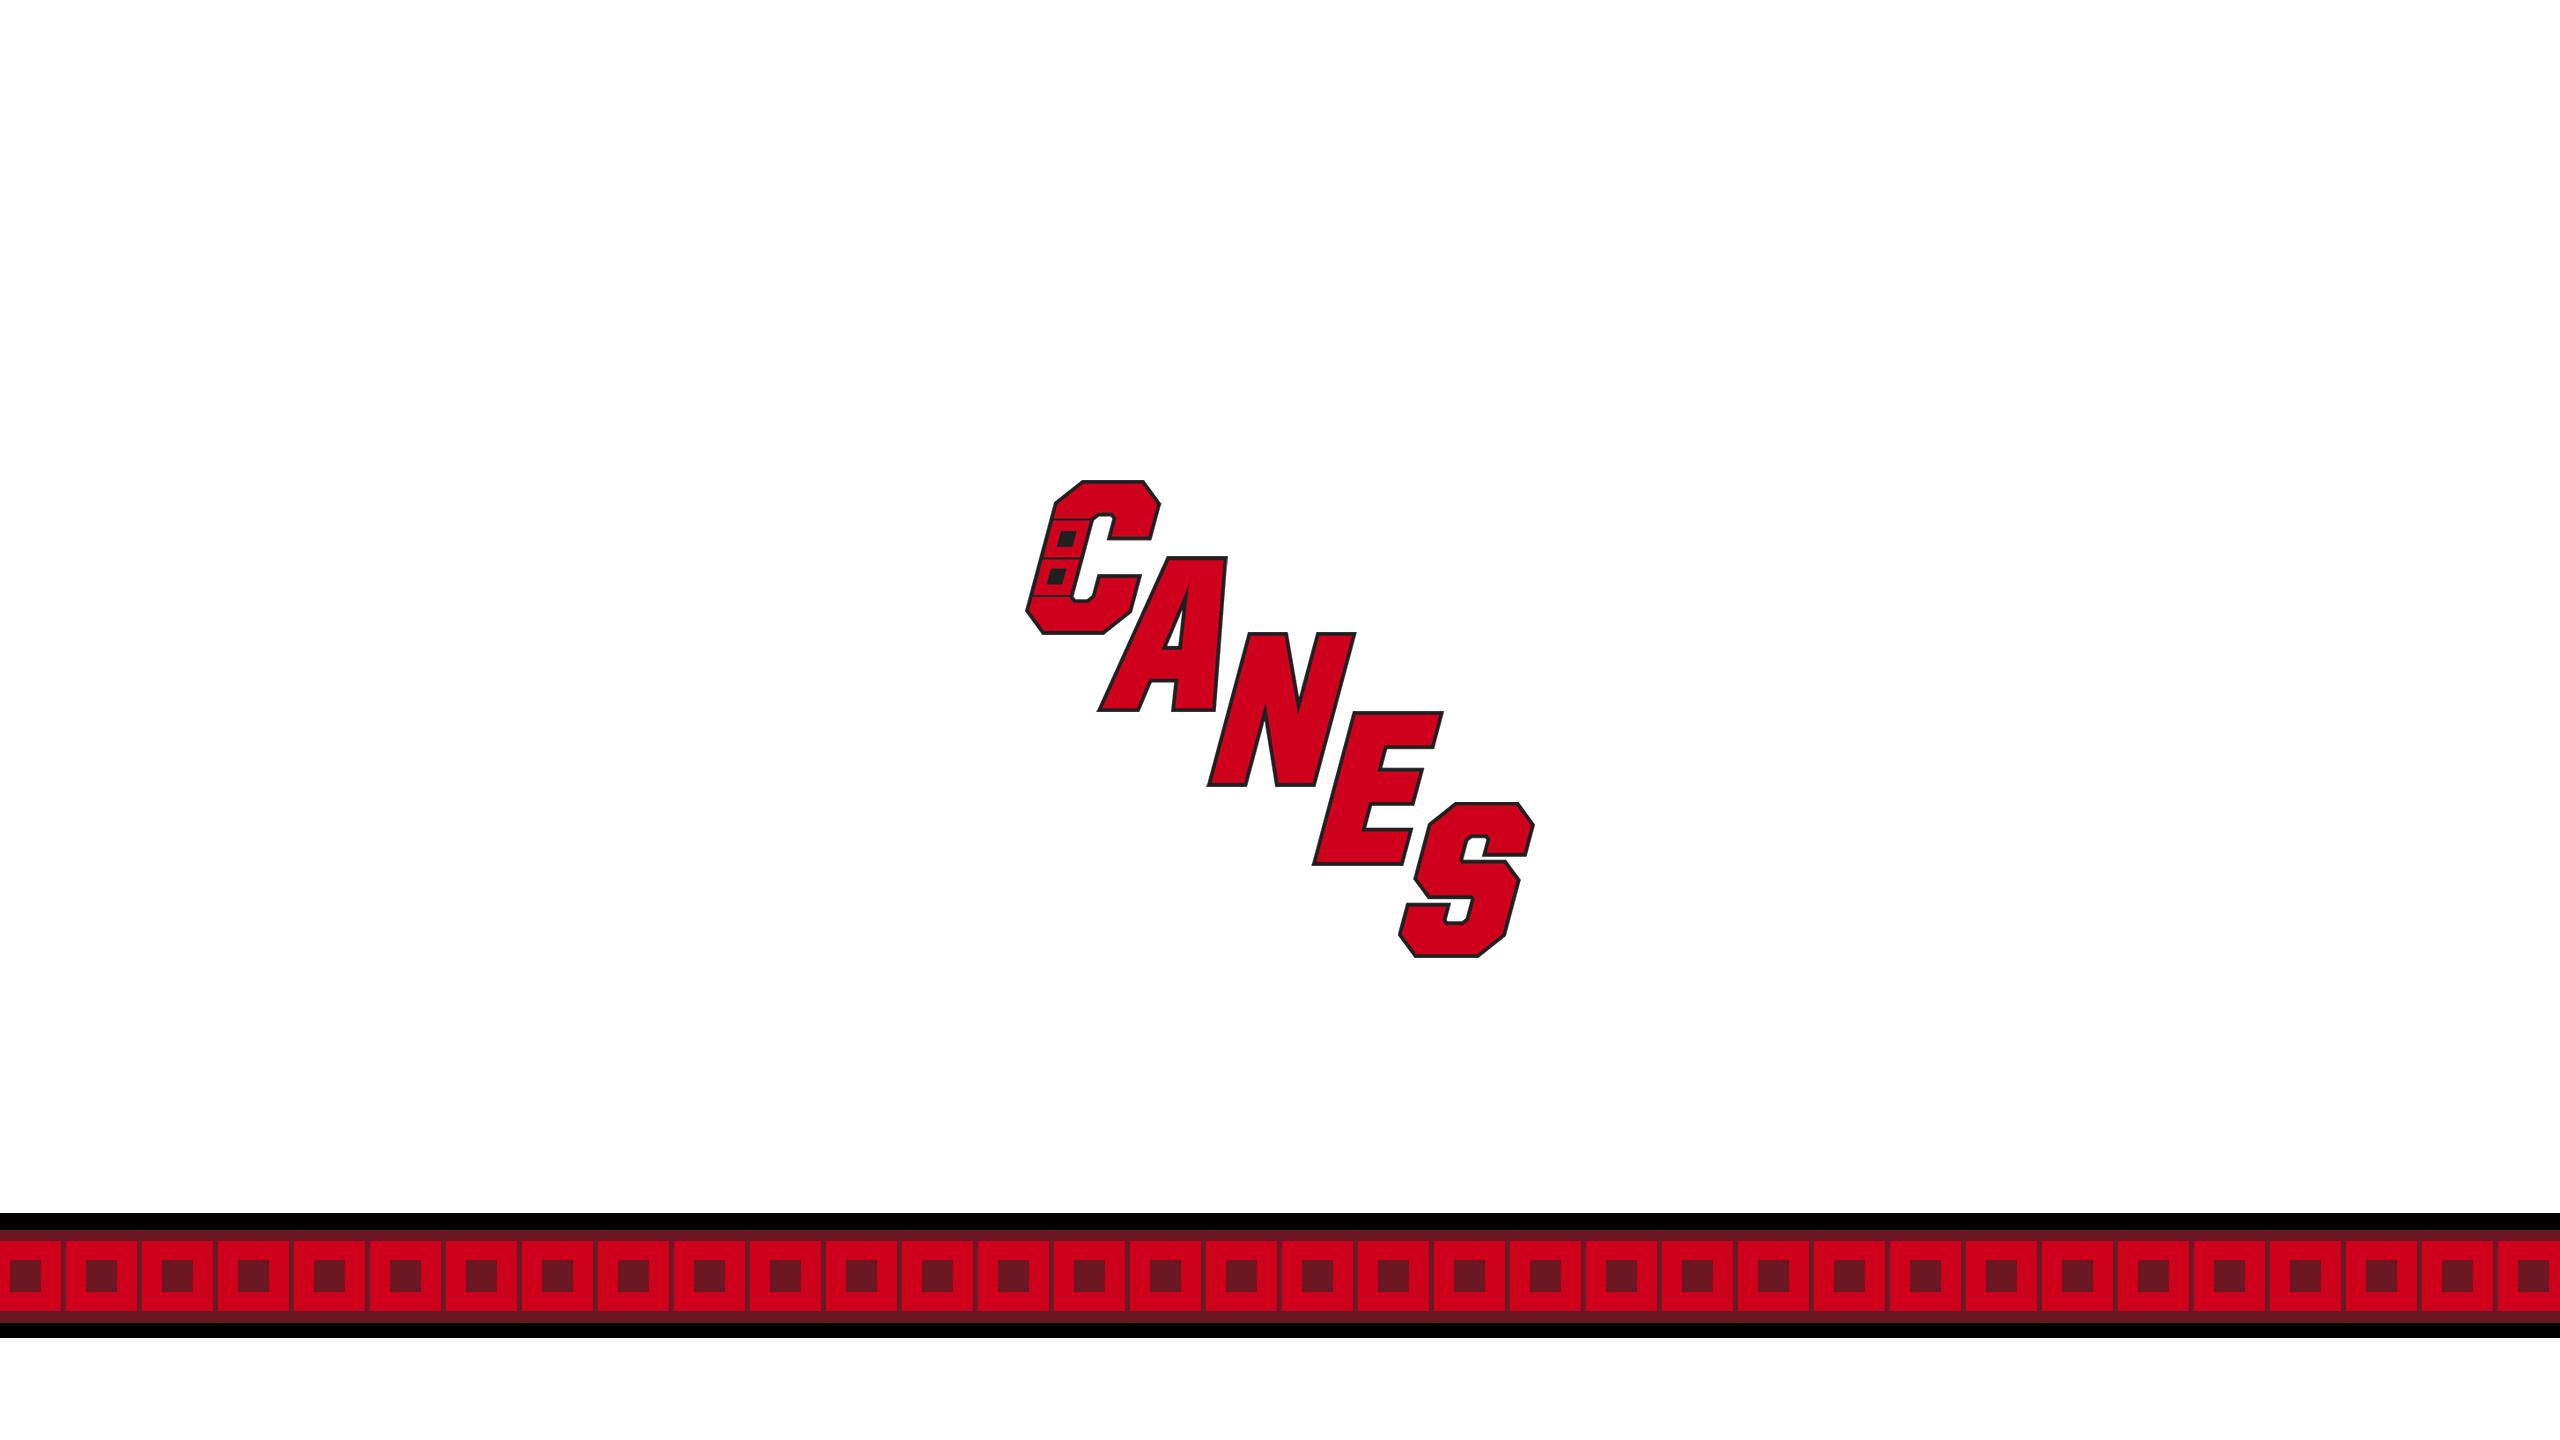 Carolina Hurricanes (Away)